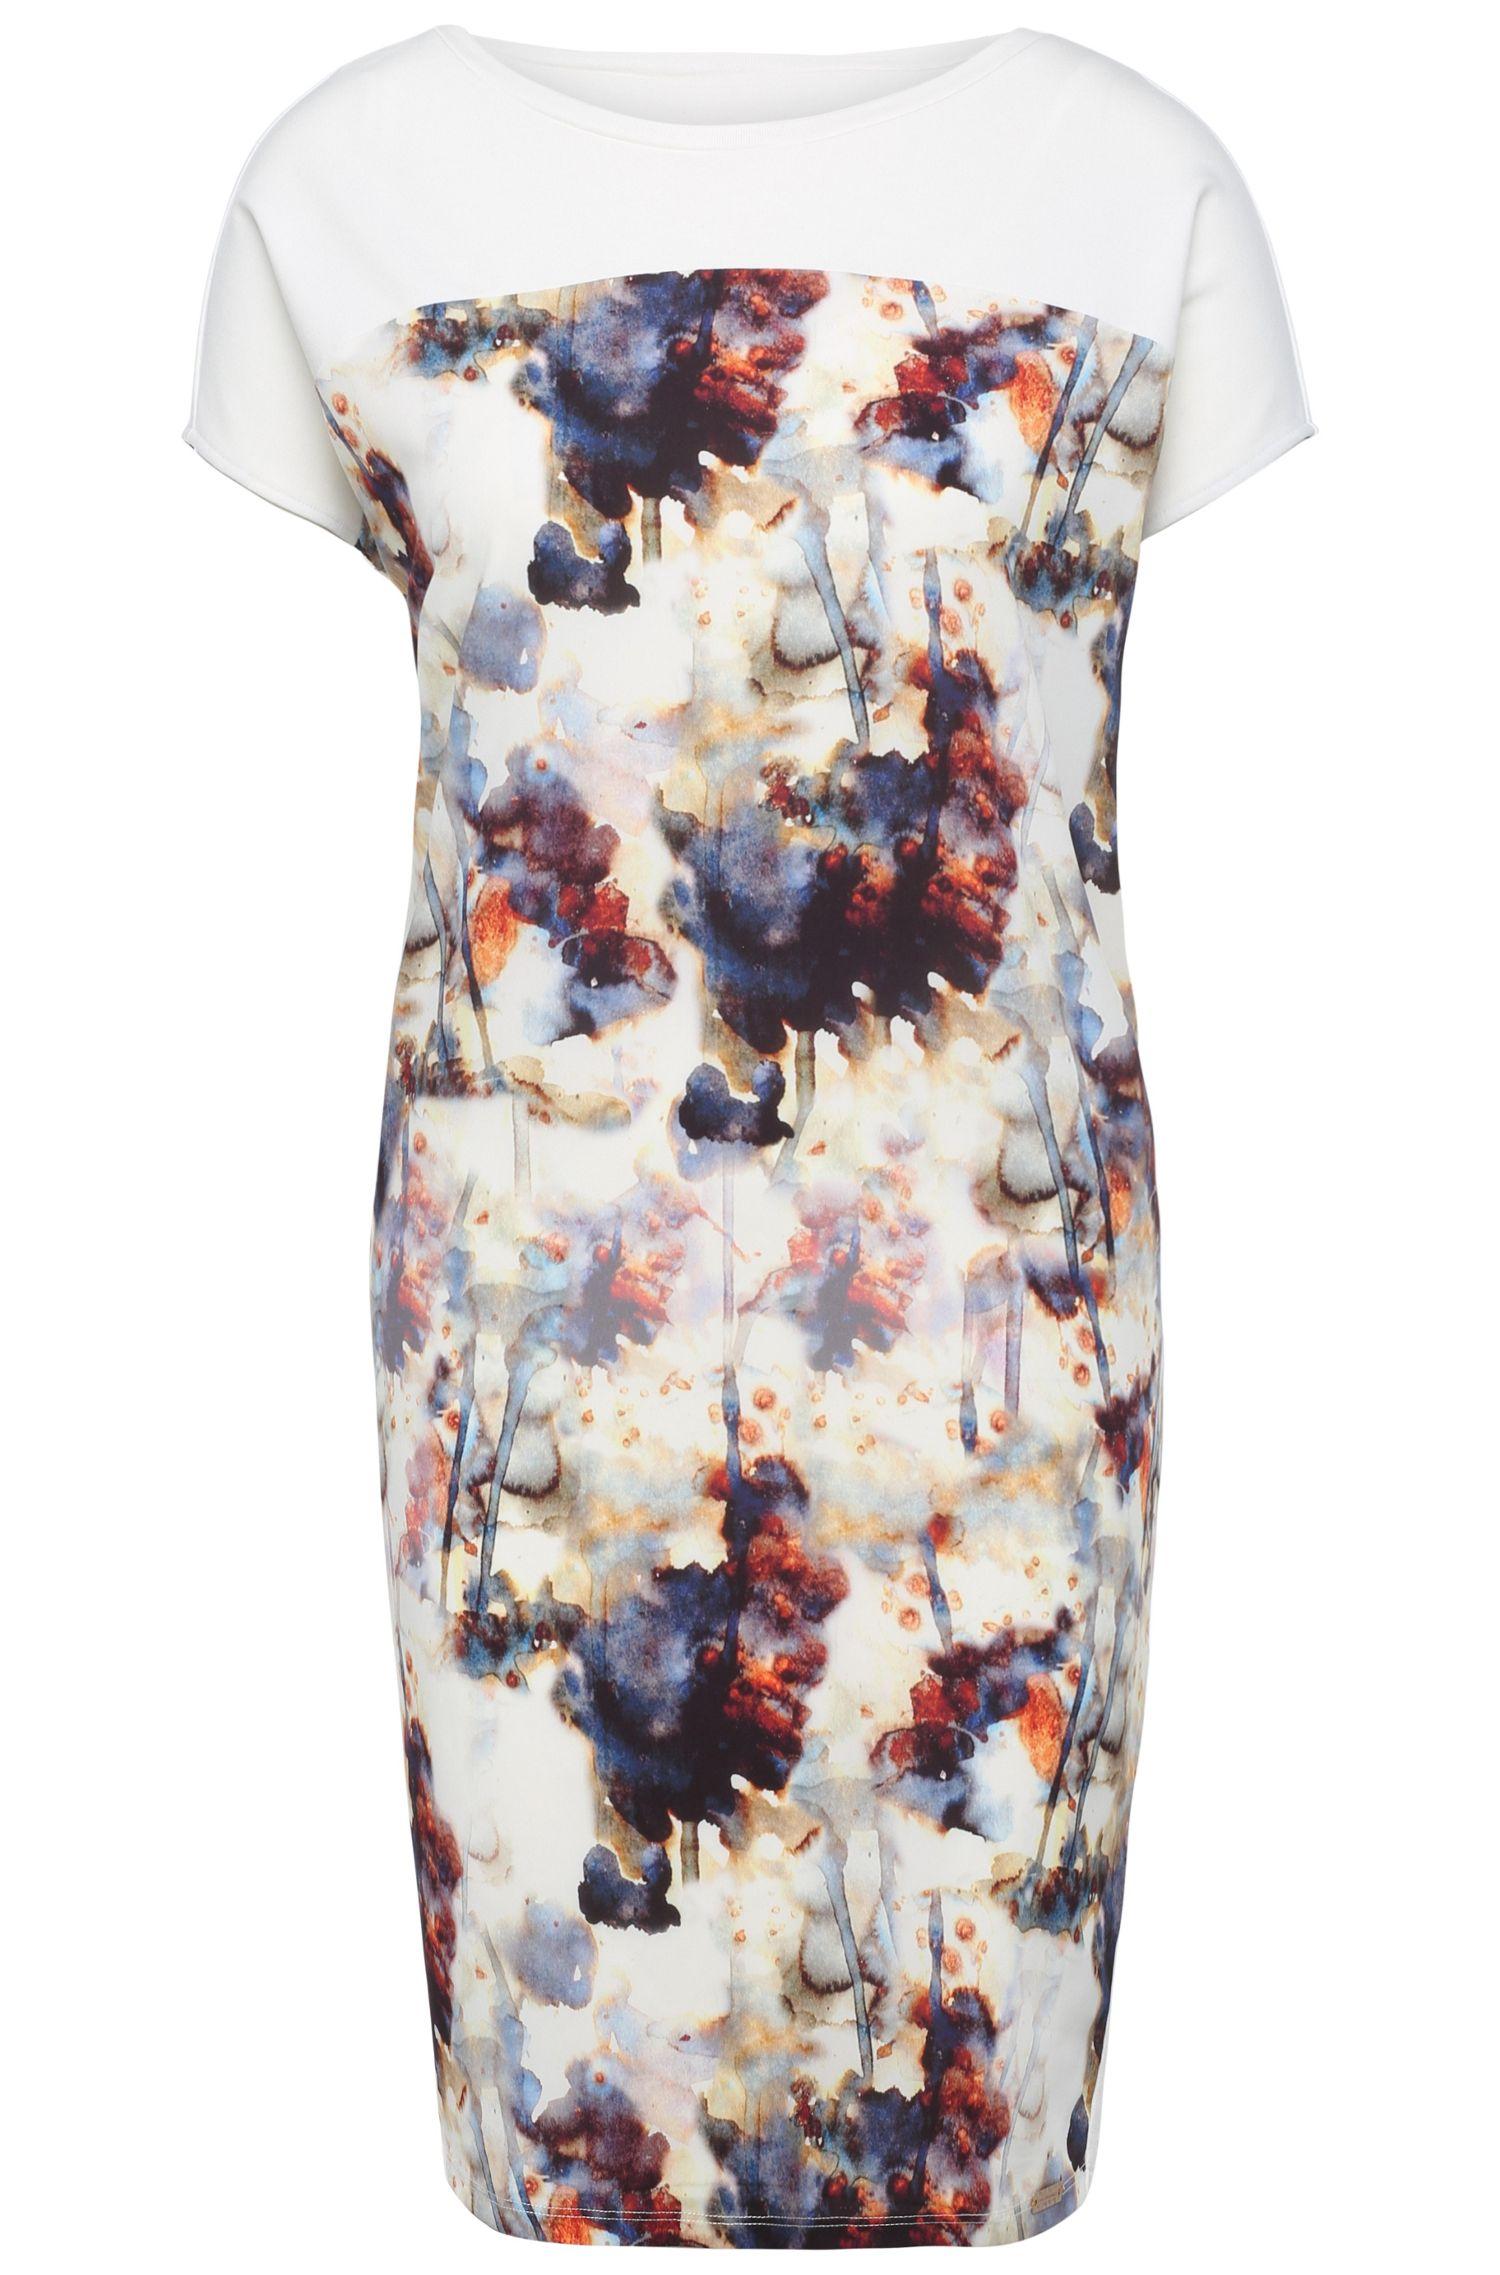 'Dimarion' | Stretch Viscose Jersey T-Shirt Dress